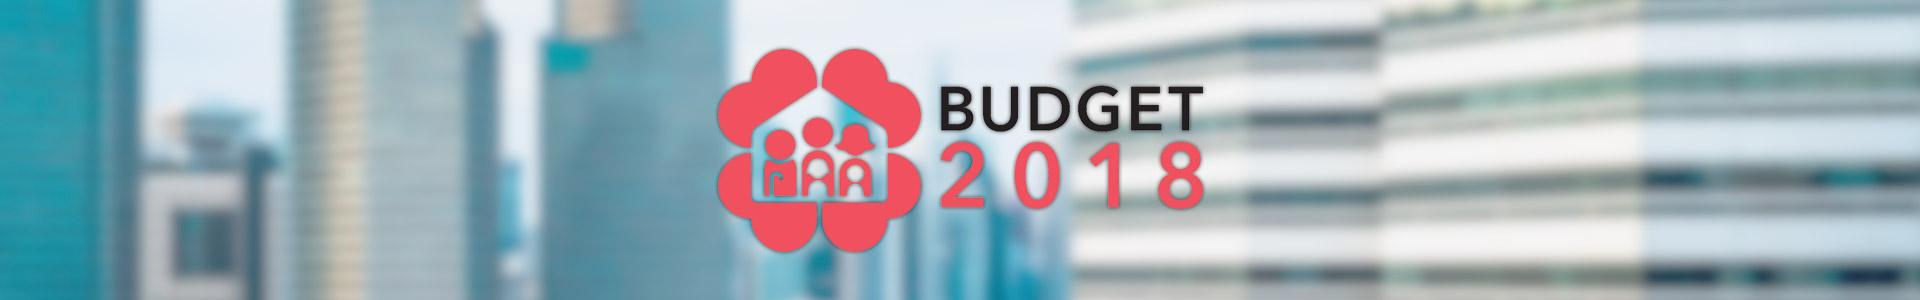 budget2015 header